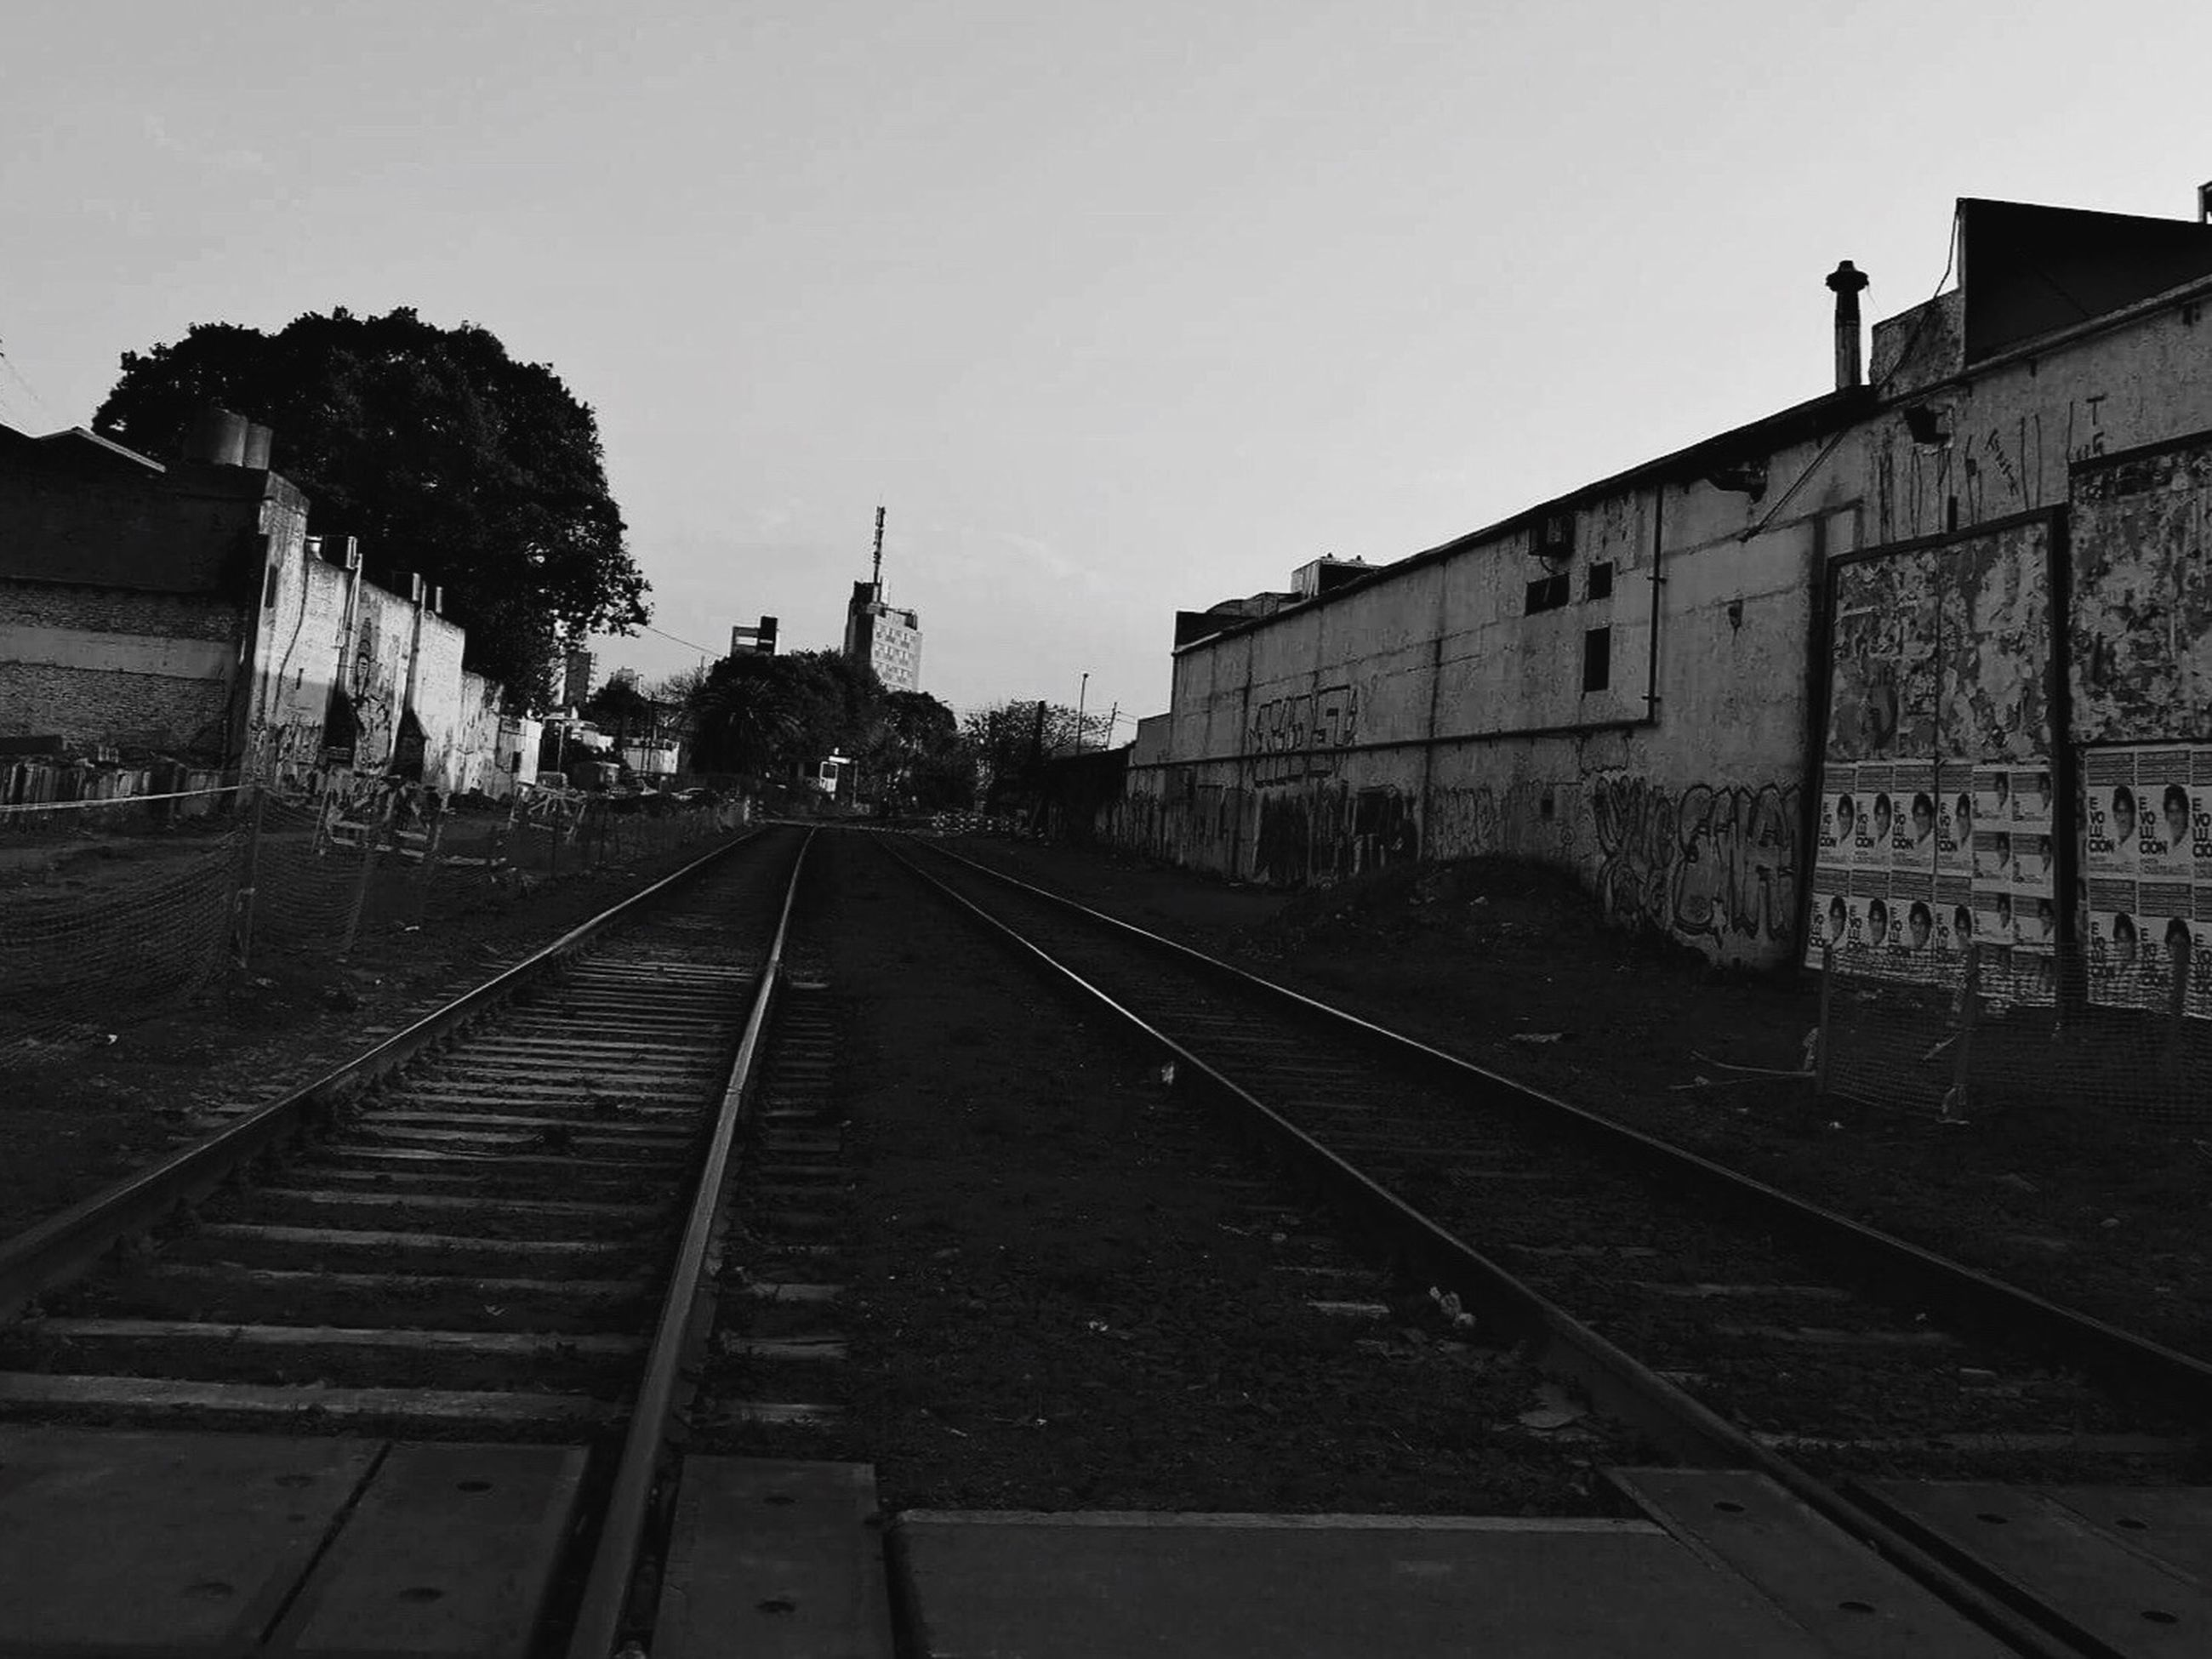 railroad track, transportation, rail transportation, built structure, architecture, clear sky, building exterior, sky, outdoors, day, public transportation, no people